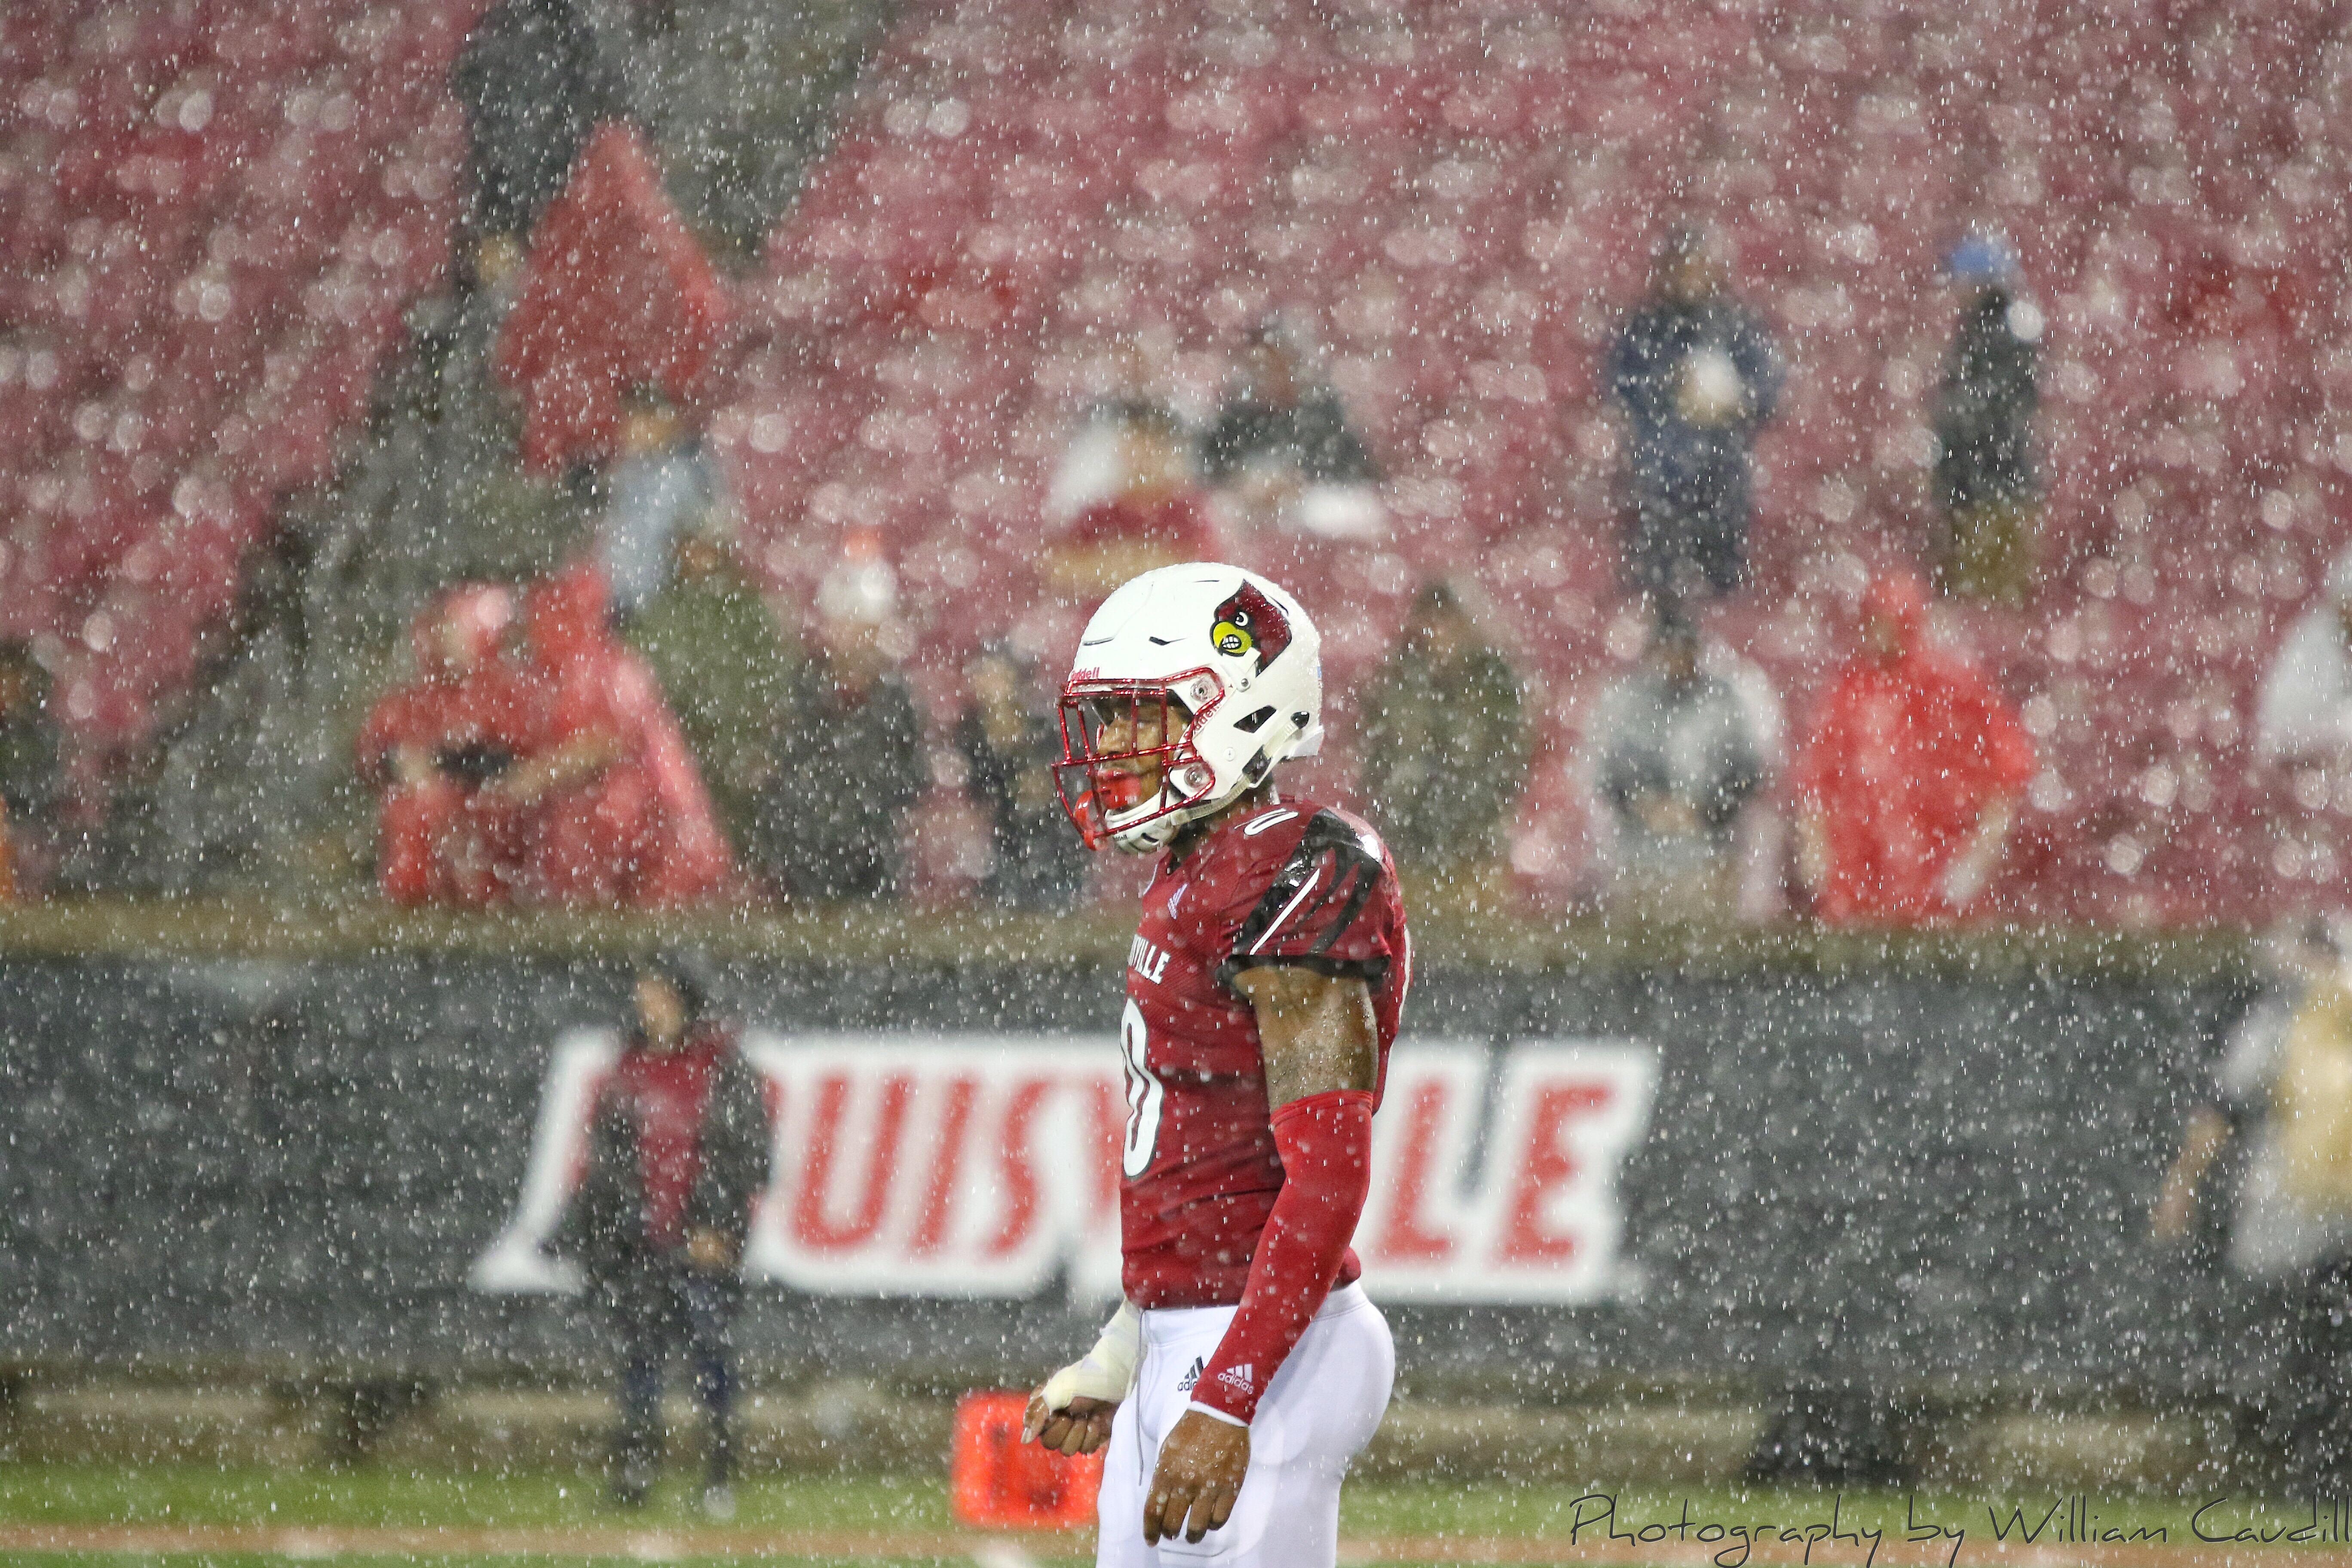 Rodjay Burns, Rain (Football) Louisville vs. Indiana State, 9-8-2018. Photo by William Caudill, TheCrunchZone.com